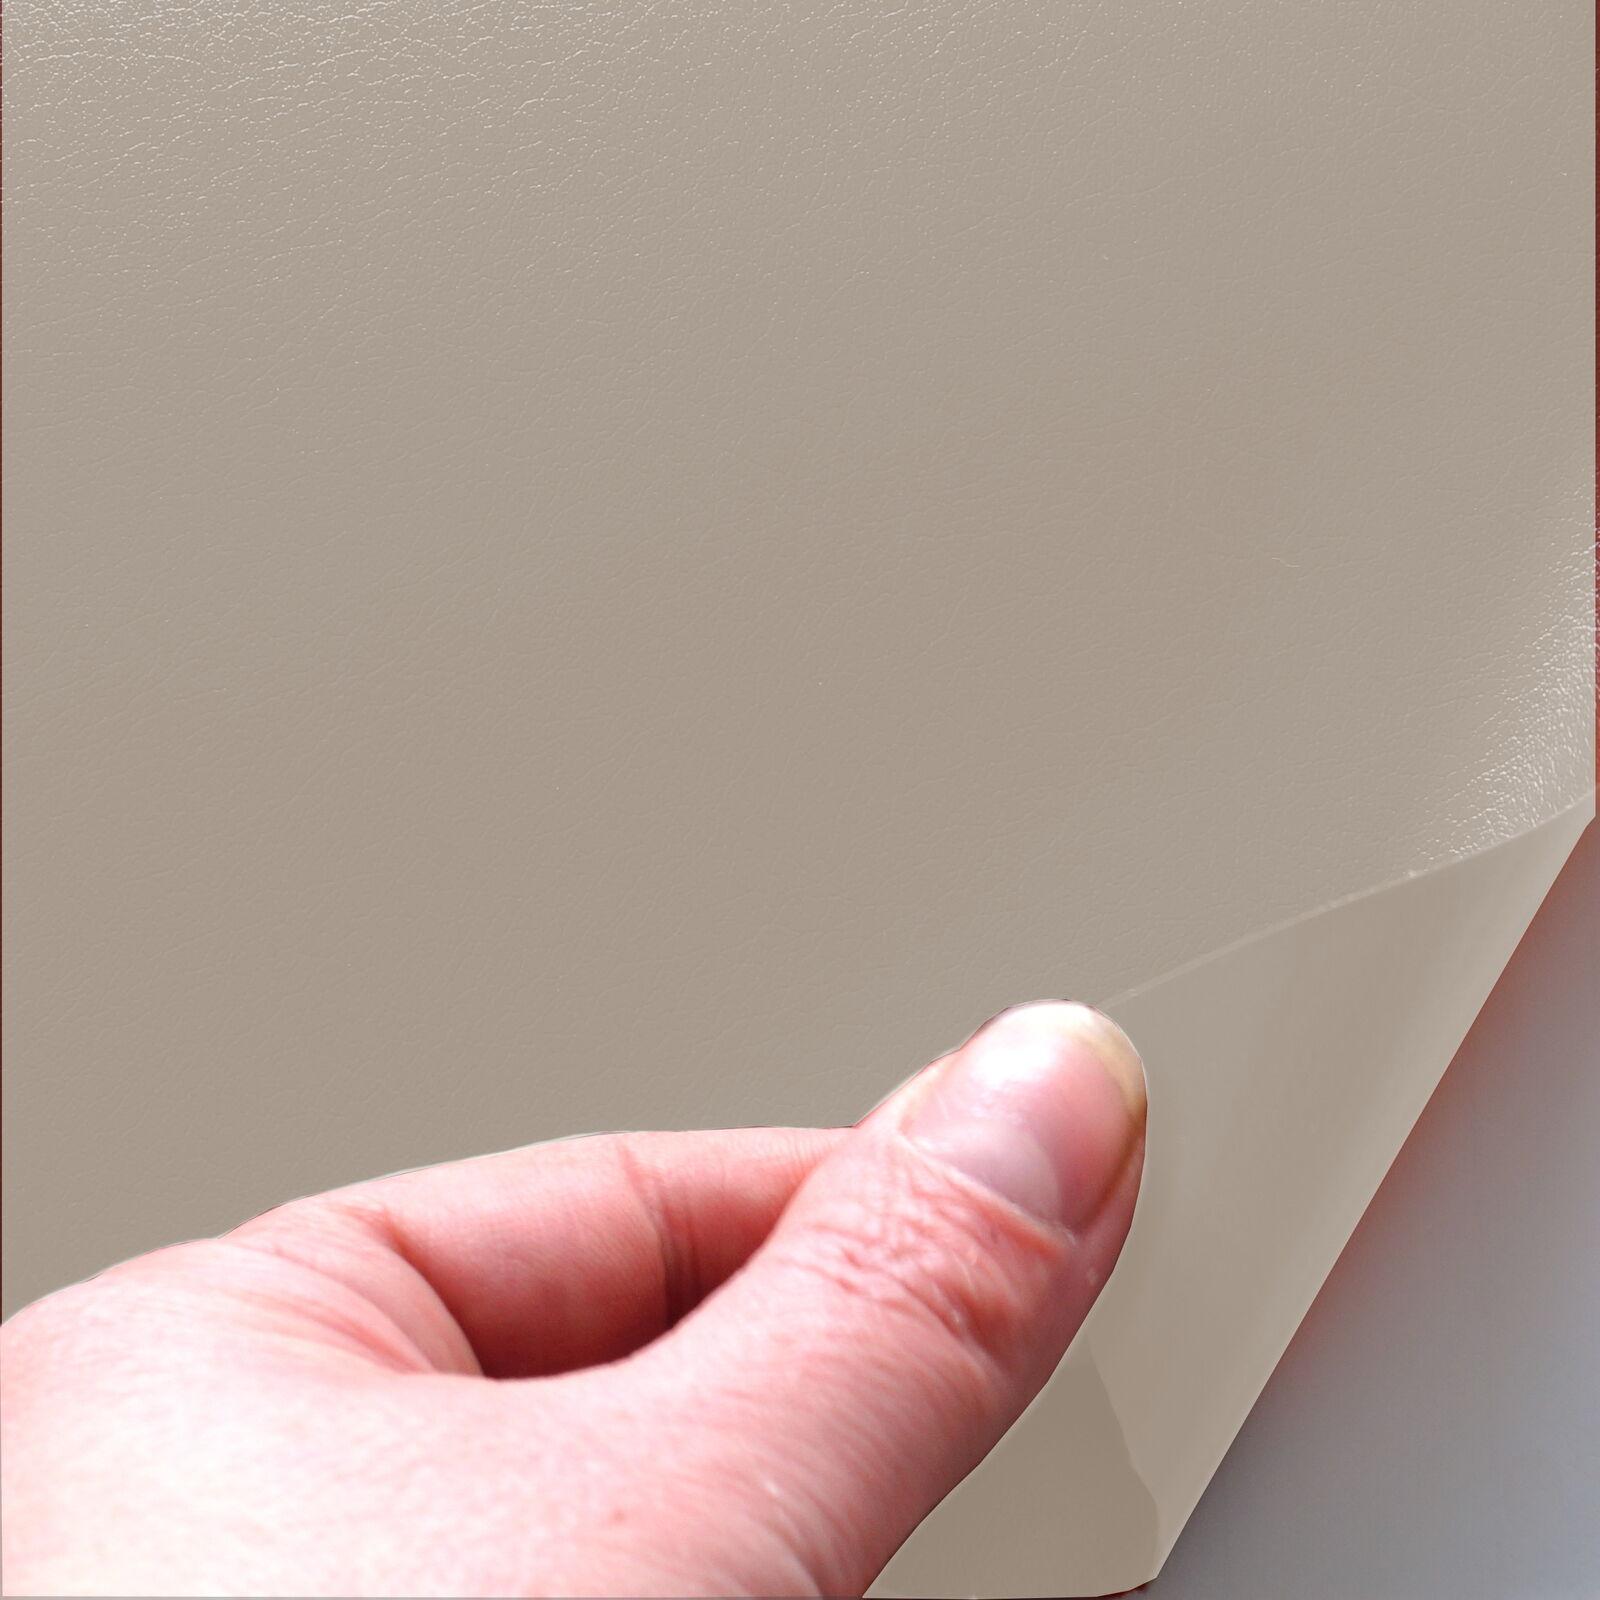 /m² PVC cuir film Beige 152 400 x 152 Beige cm Auto Meubles Film simili cuir 458191